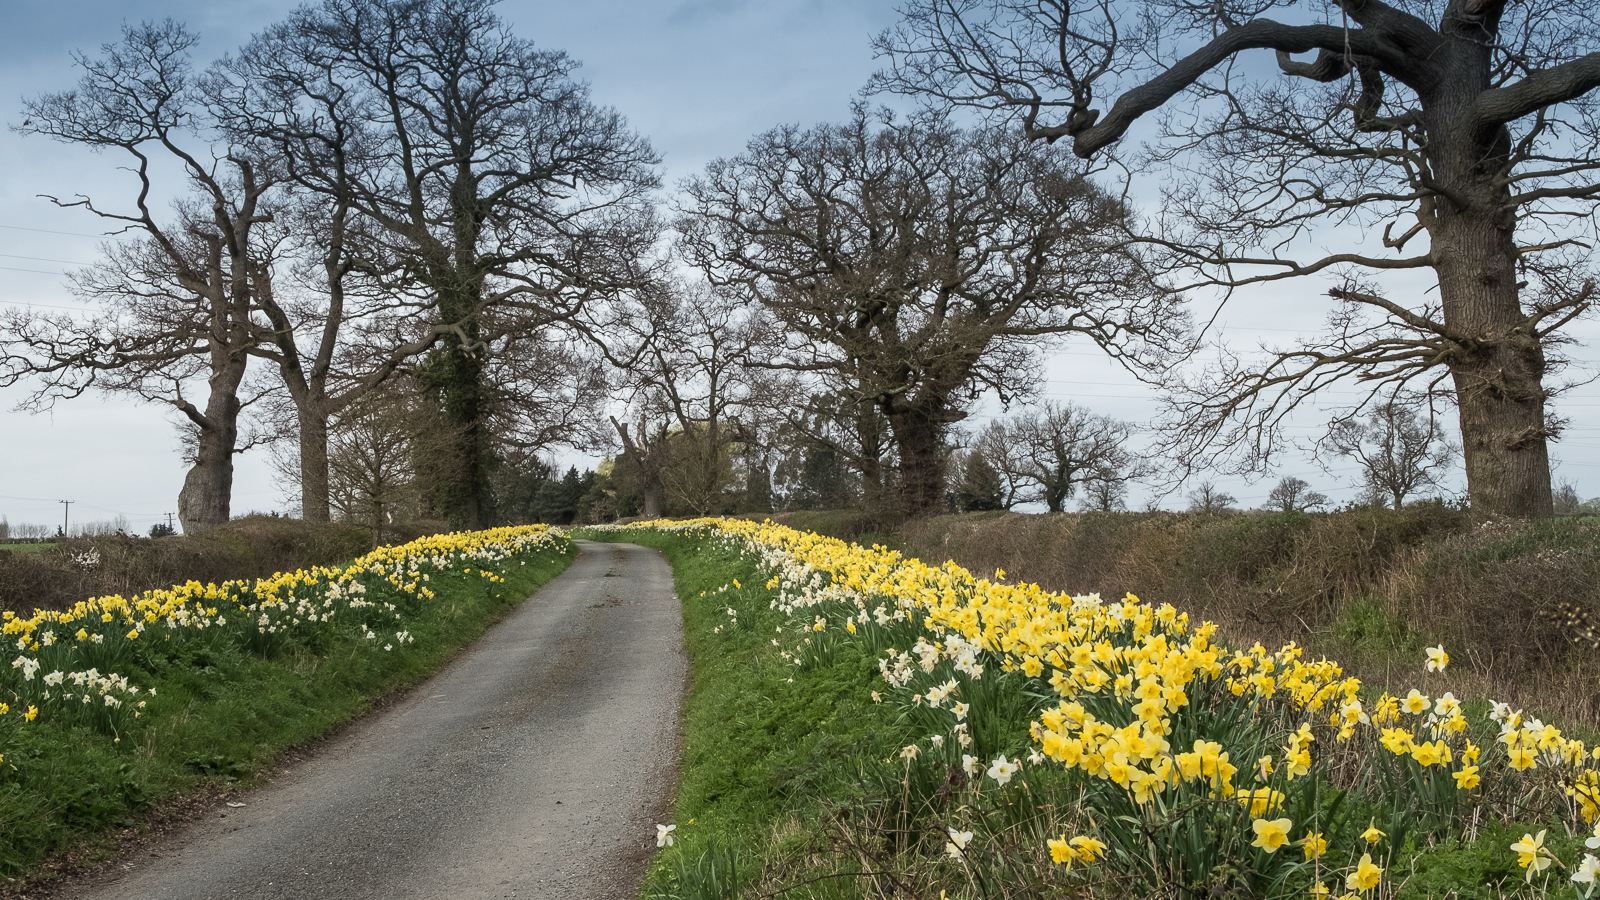 Dyrham-Lane-Looking-Splendid.jpg